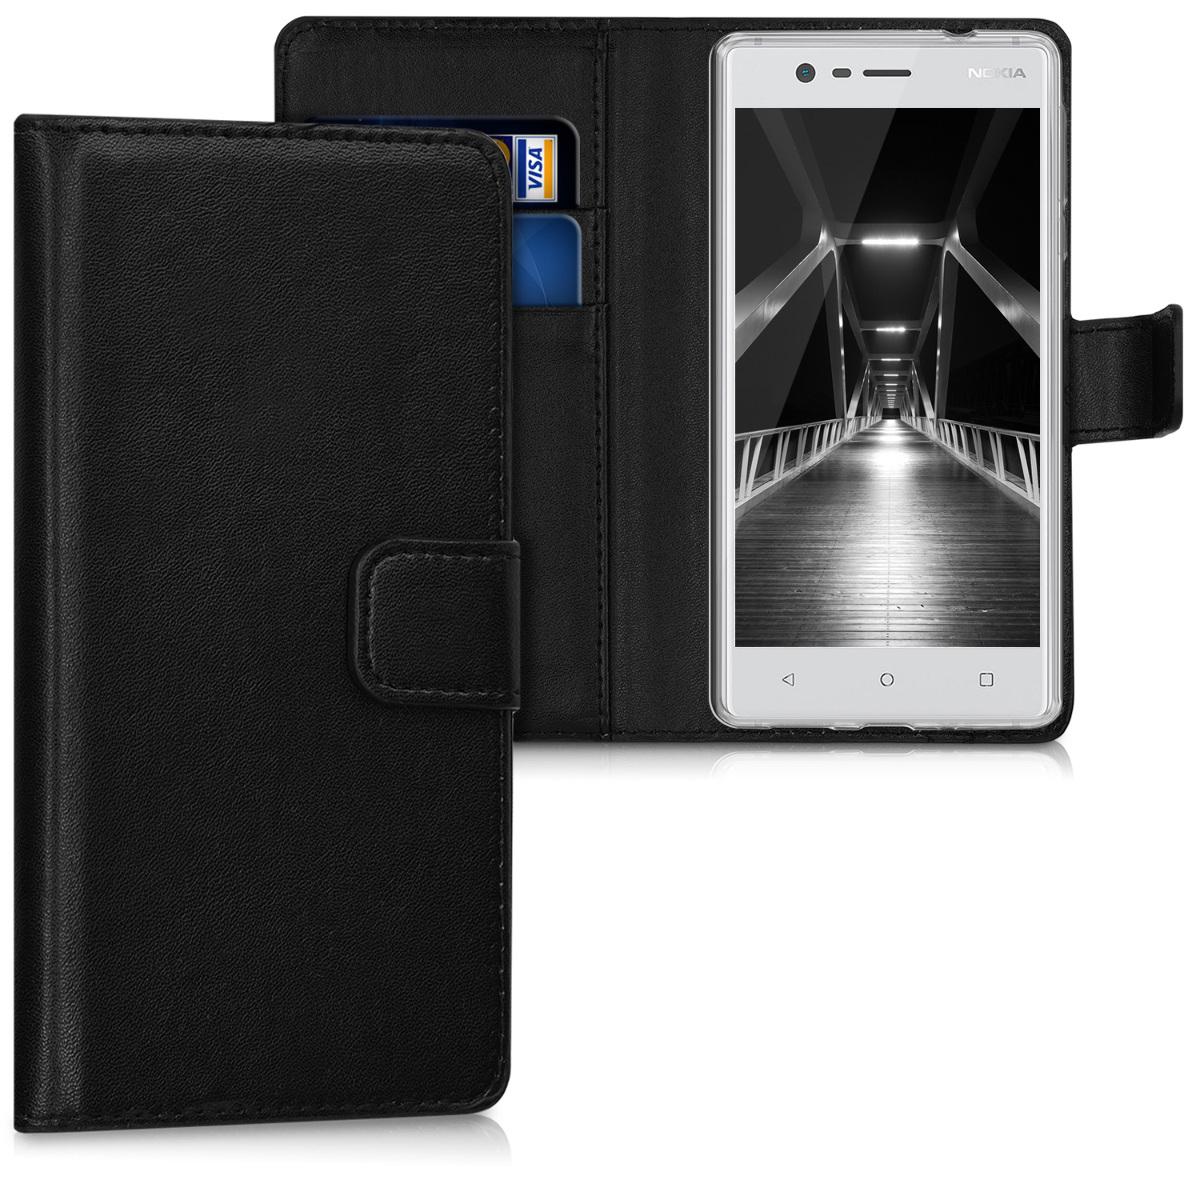 KW Θήκη - Πορτοφόλι Nokia 3 - Black (42881.01)